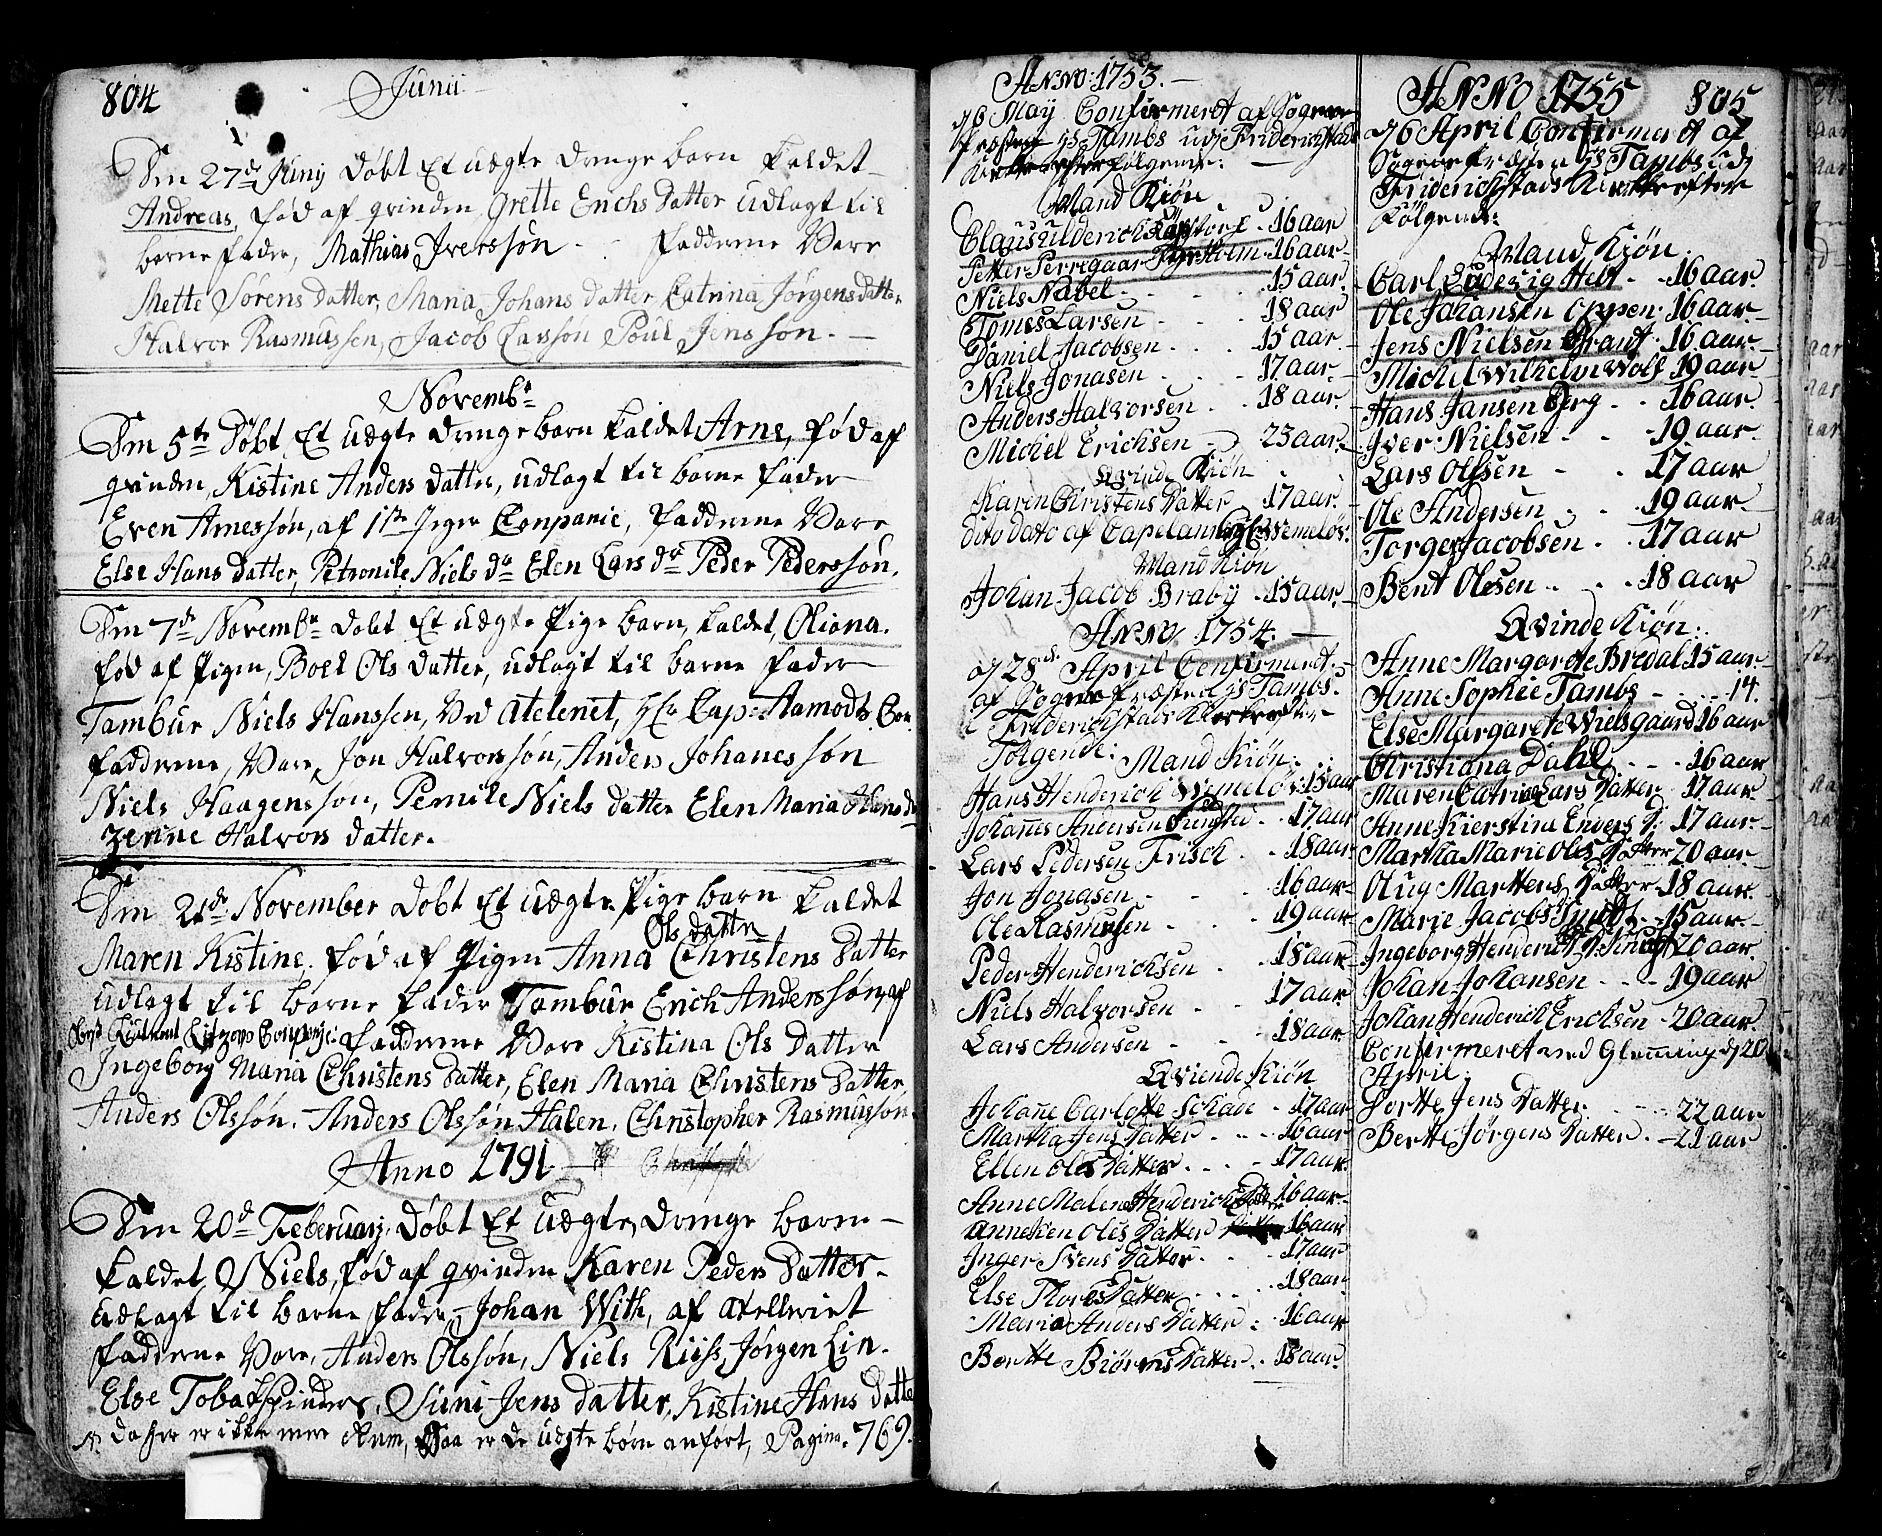 SAO, Fredrikstad prestekontor Kirkebøker, F/Fa/L0002: Ministerialbok nr. 2, 1750-1804, s. 804-805